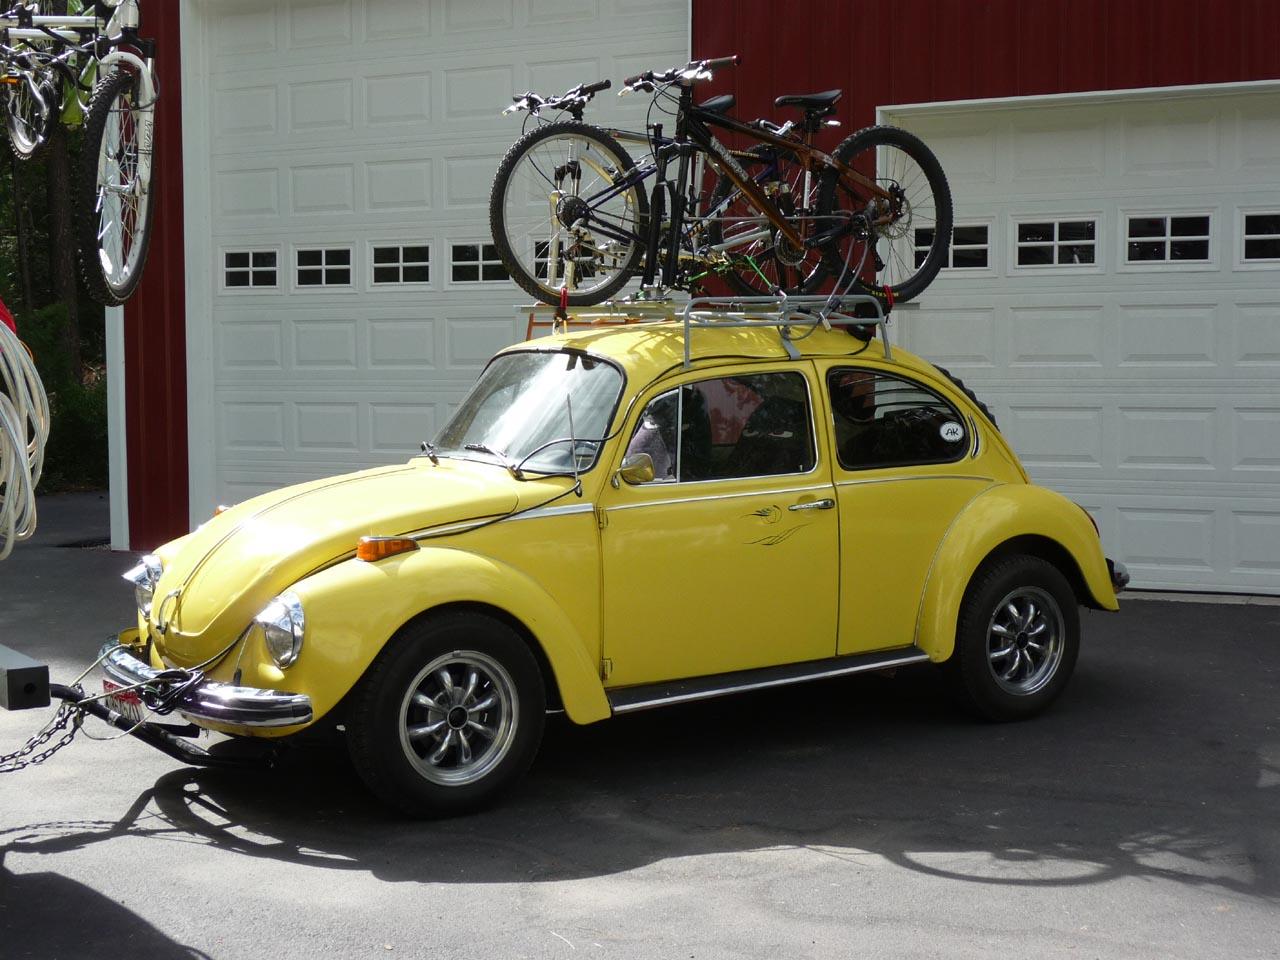 1968 beetle roof rack question